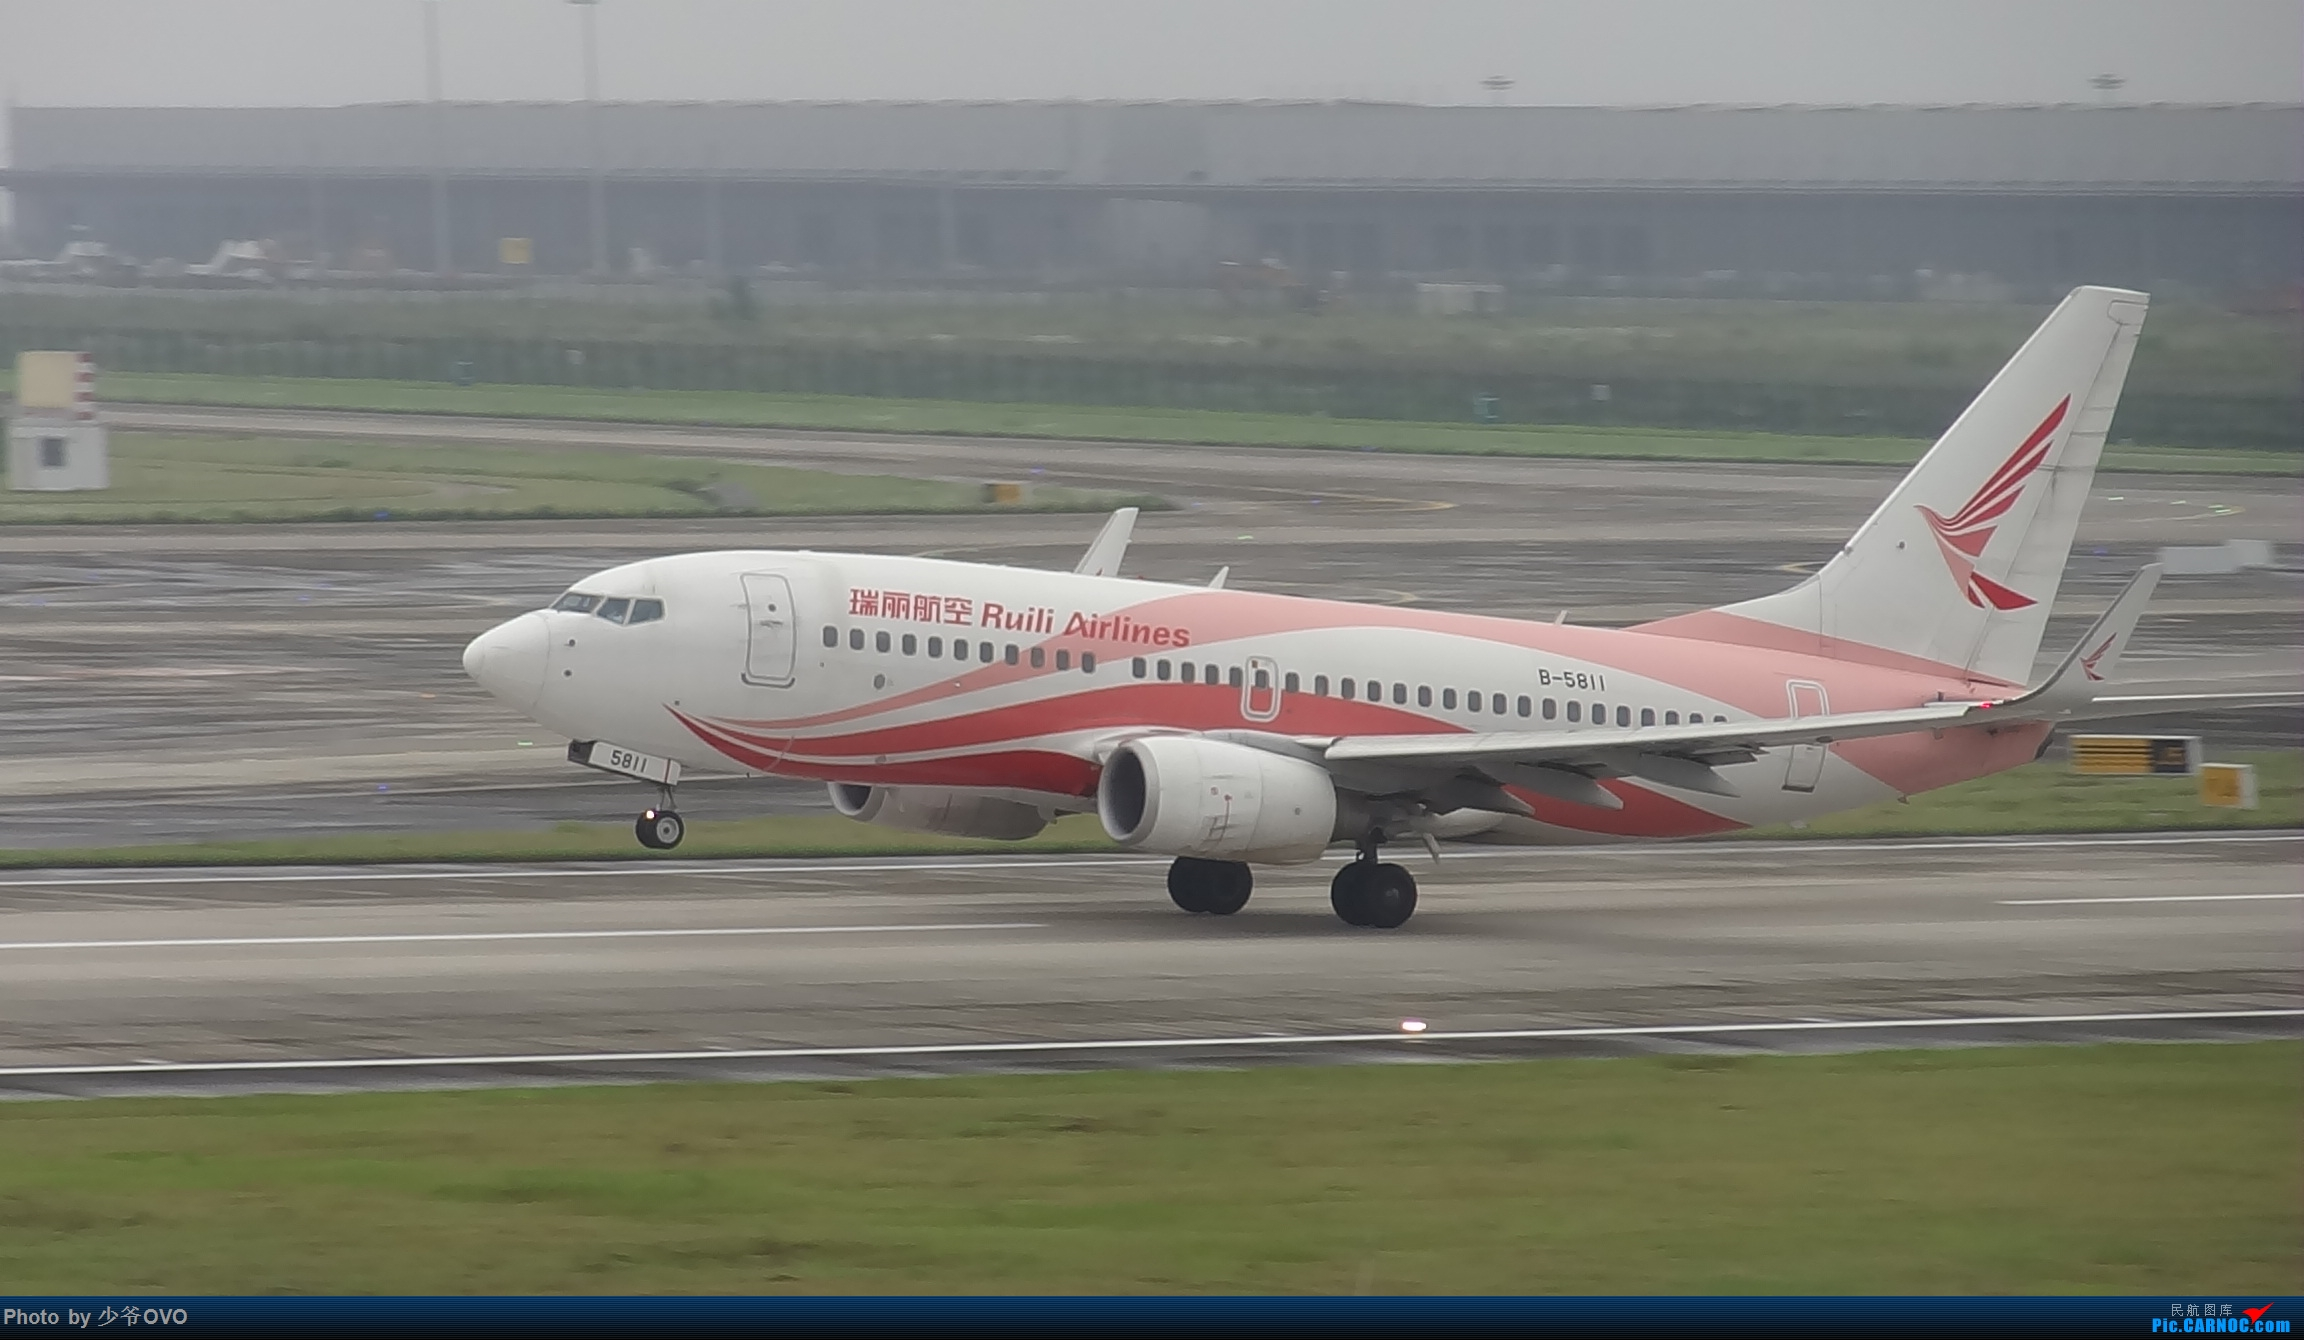 Re:[原创]CKG重庆江北机场拍机 ,中法建交50周年 BOEING 737-700 B-5811 中国重庆江北国际机场